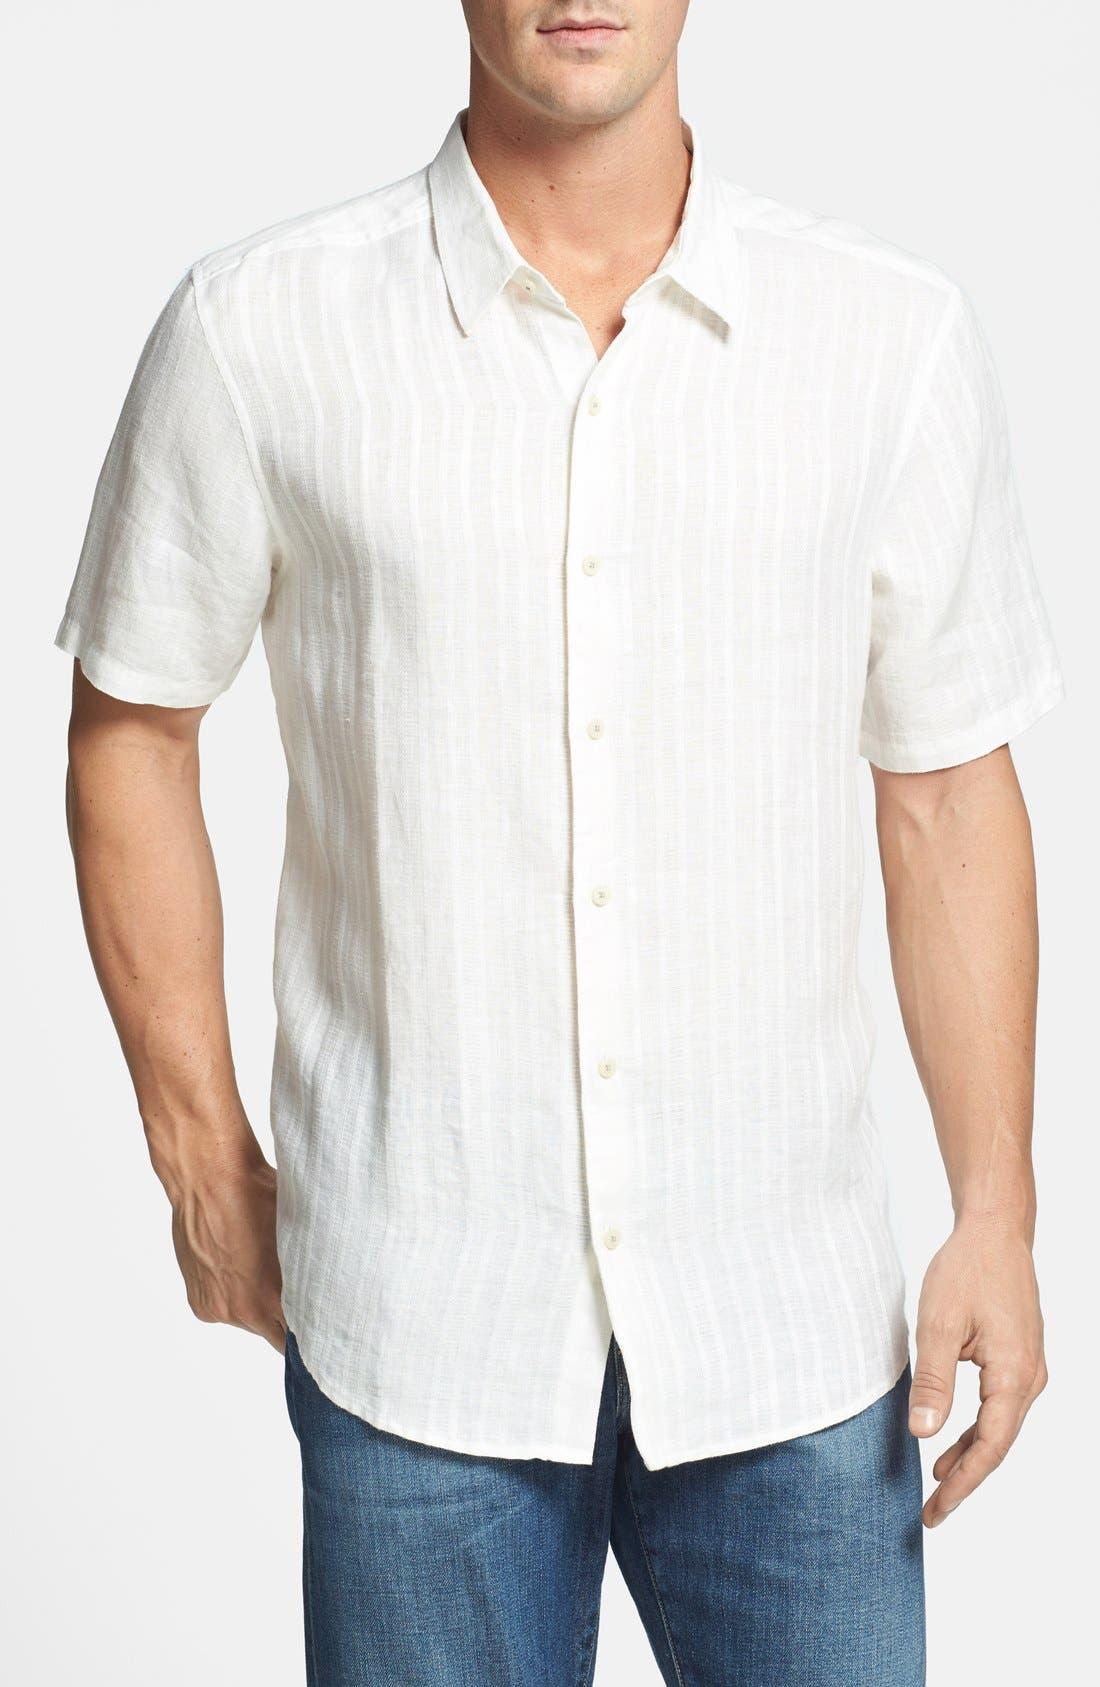 Alternate Image 1 Selected - Tommy Bahama Island Modern Fit Linen Sport Shirt